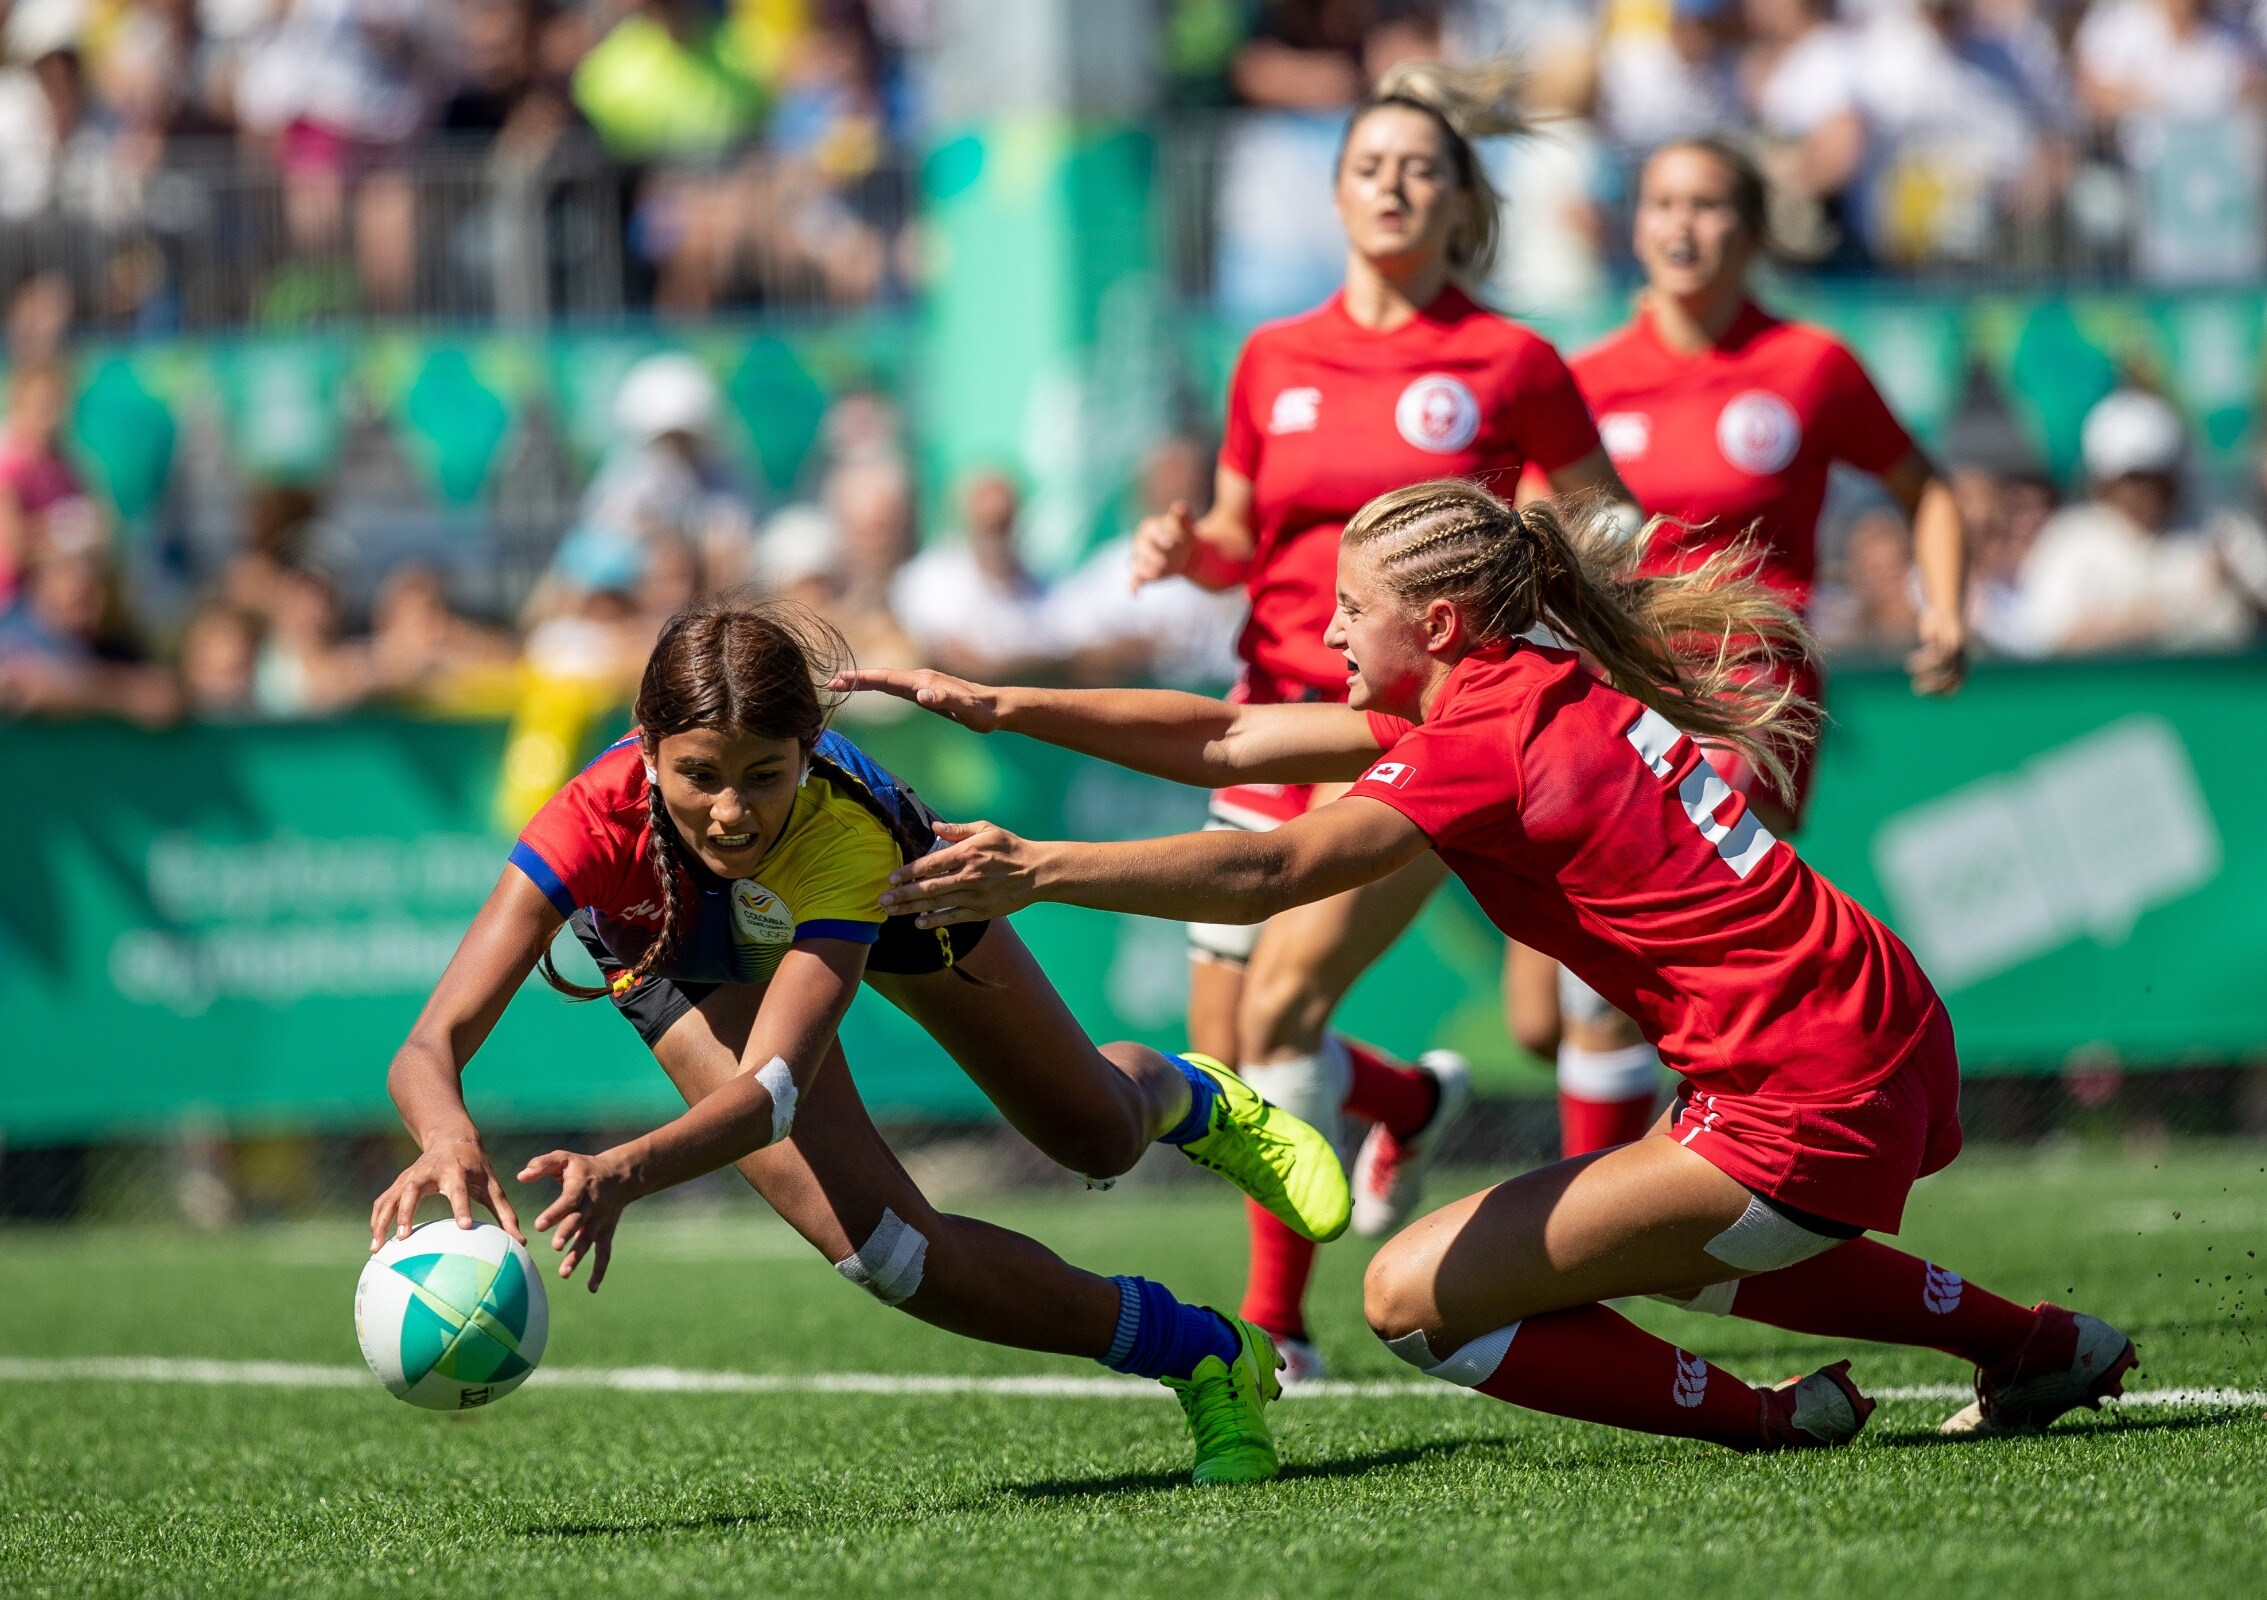 Buenos Aires 2018 - Rugby à sept - Tournoi féminin